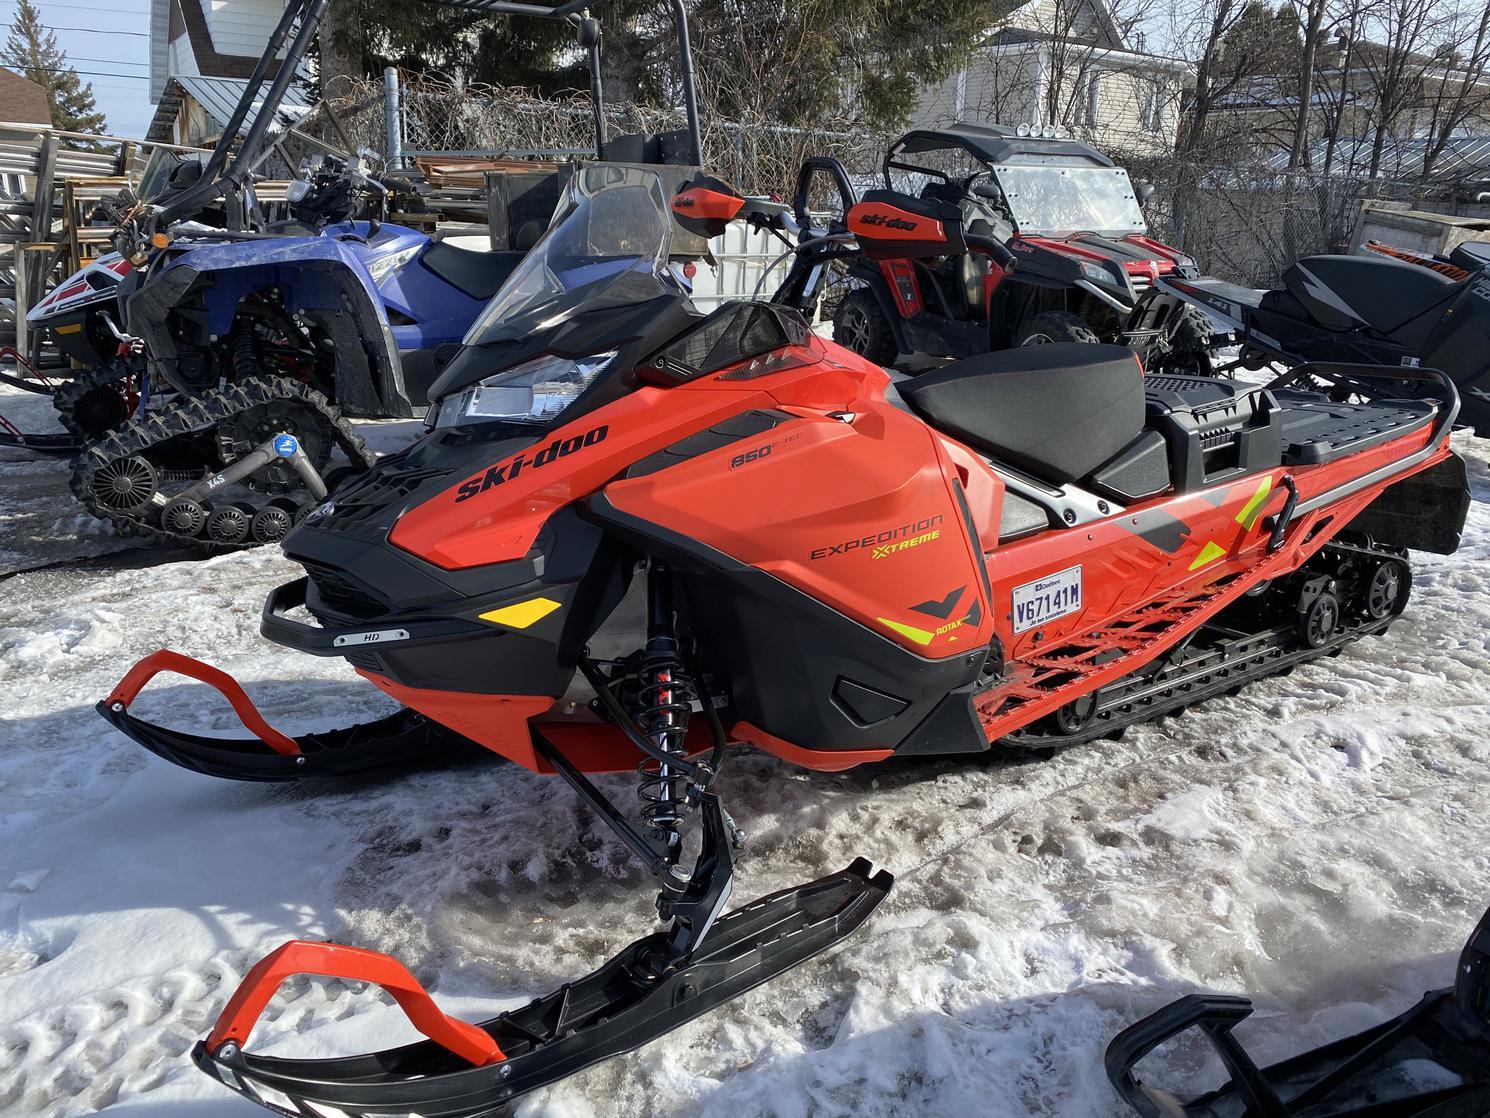 Ski-Doo Expedition Extreme 850 e tec 2021 - Brp / ski doo / bombardier xtreme